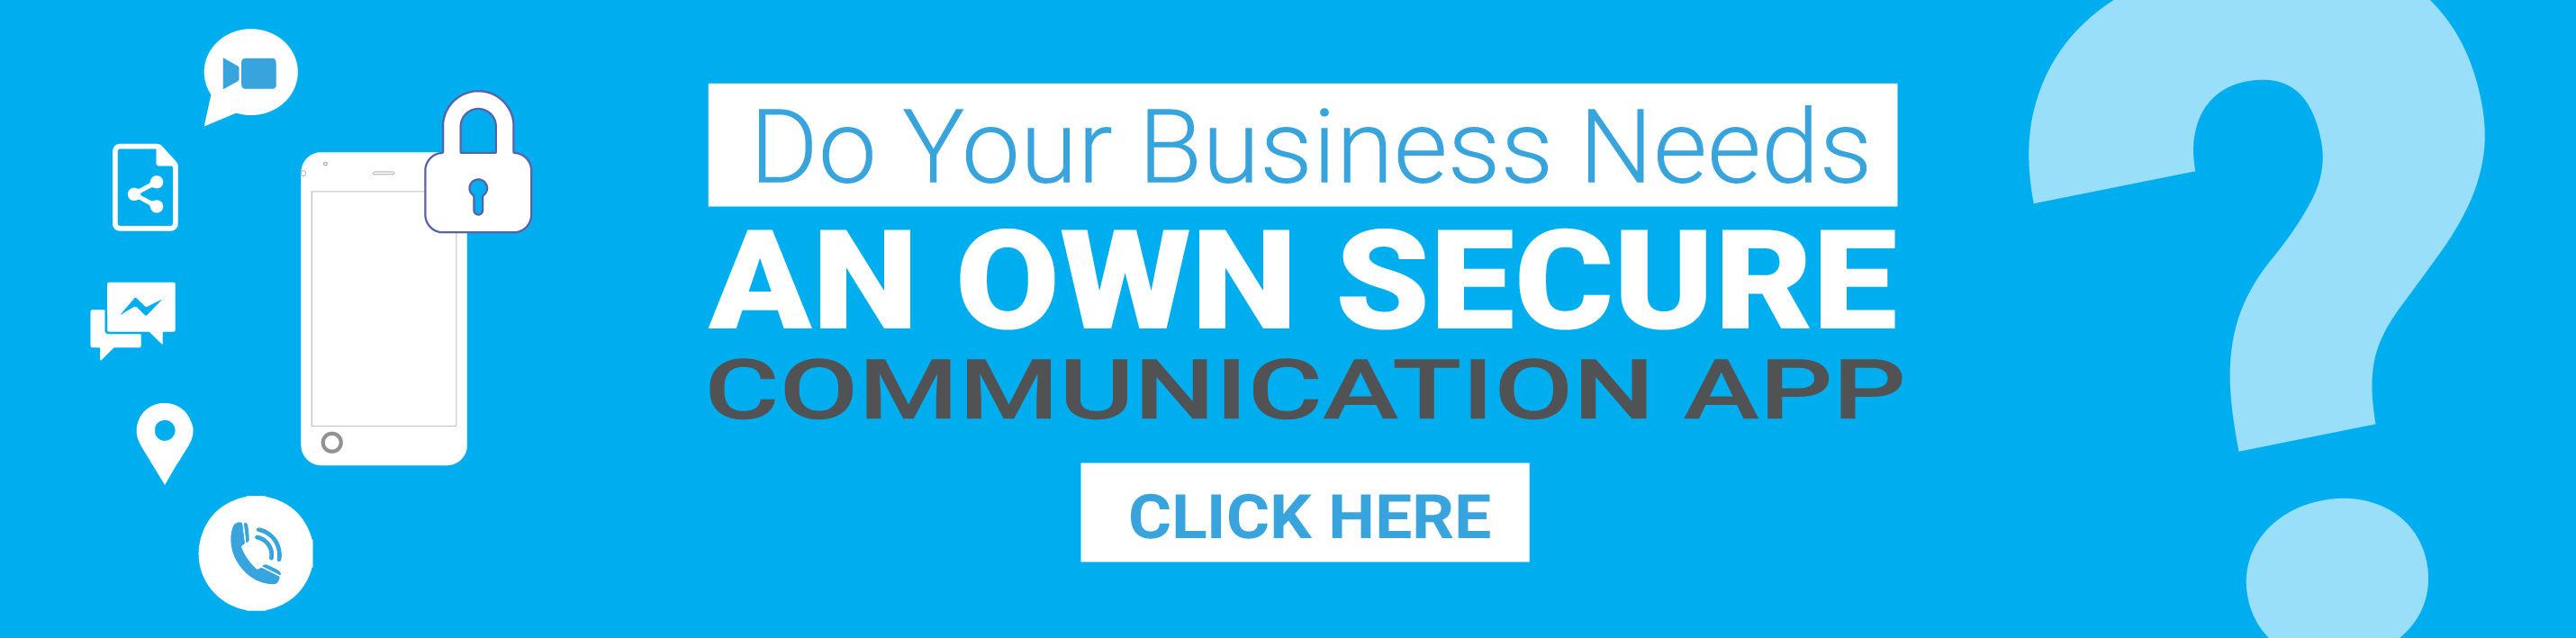 cta-blog-enterprise-instant-messaging-app